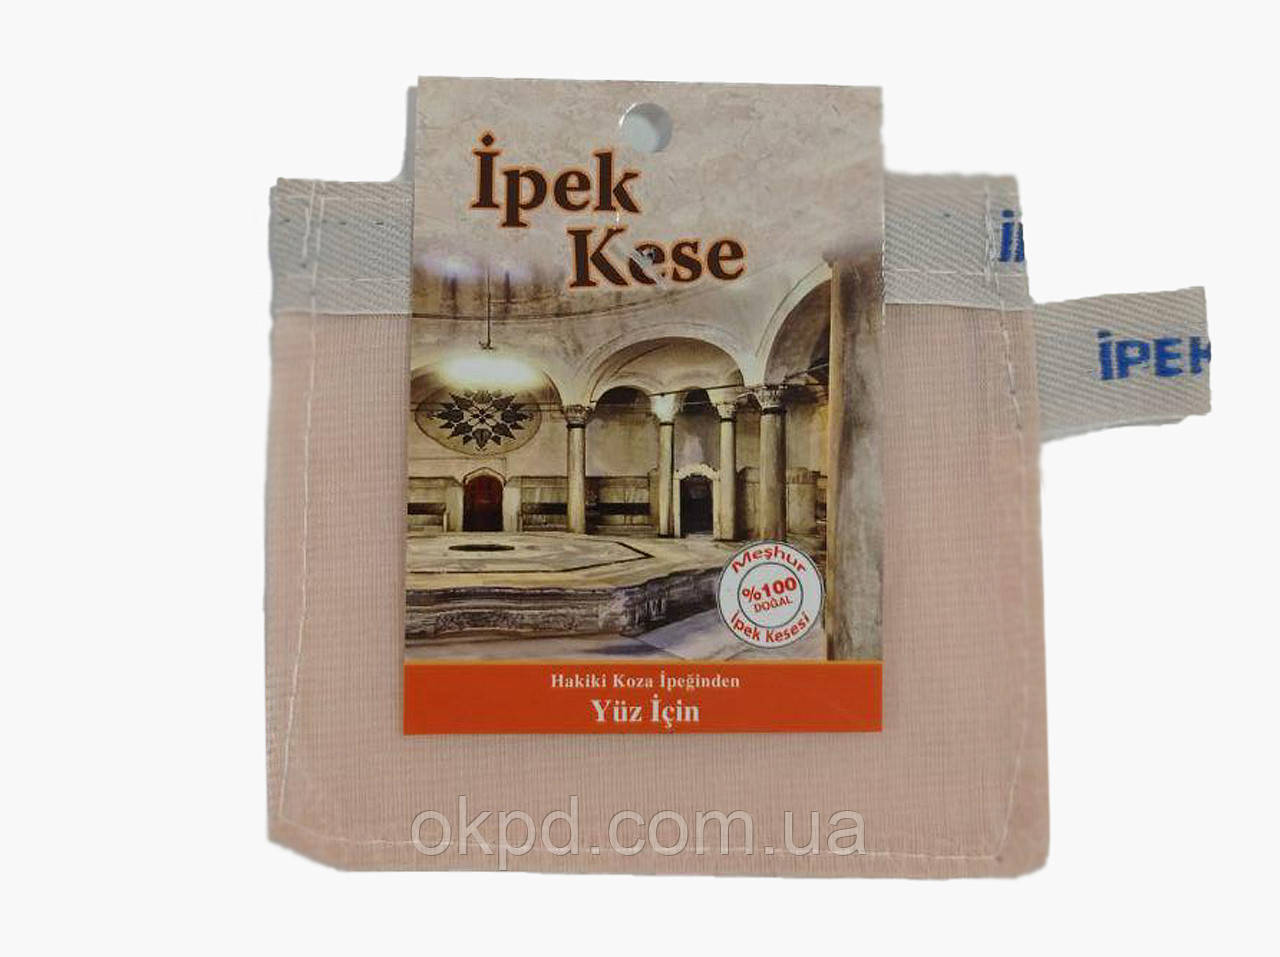 Кесе для лица IPEK (шелк) 8х8см для хаммама - турецкой бани